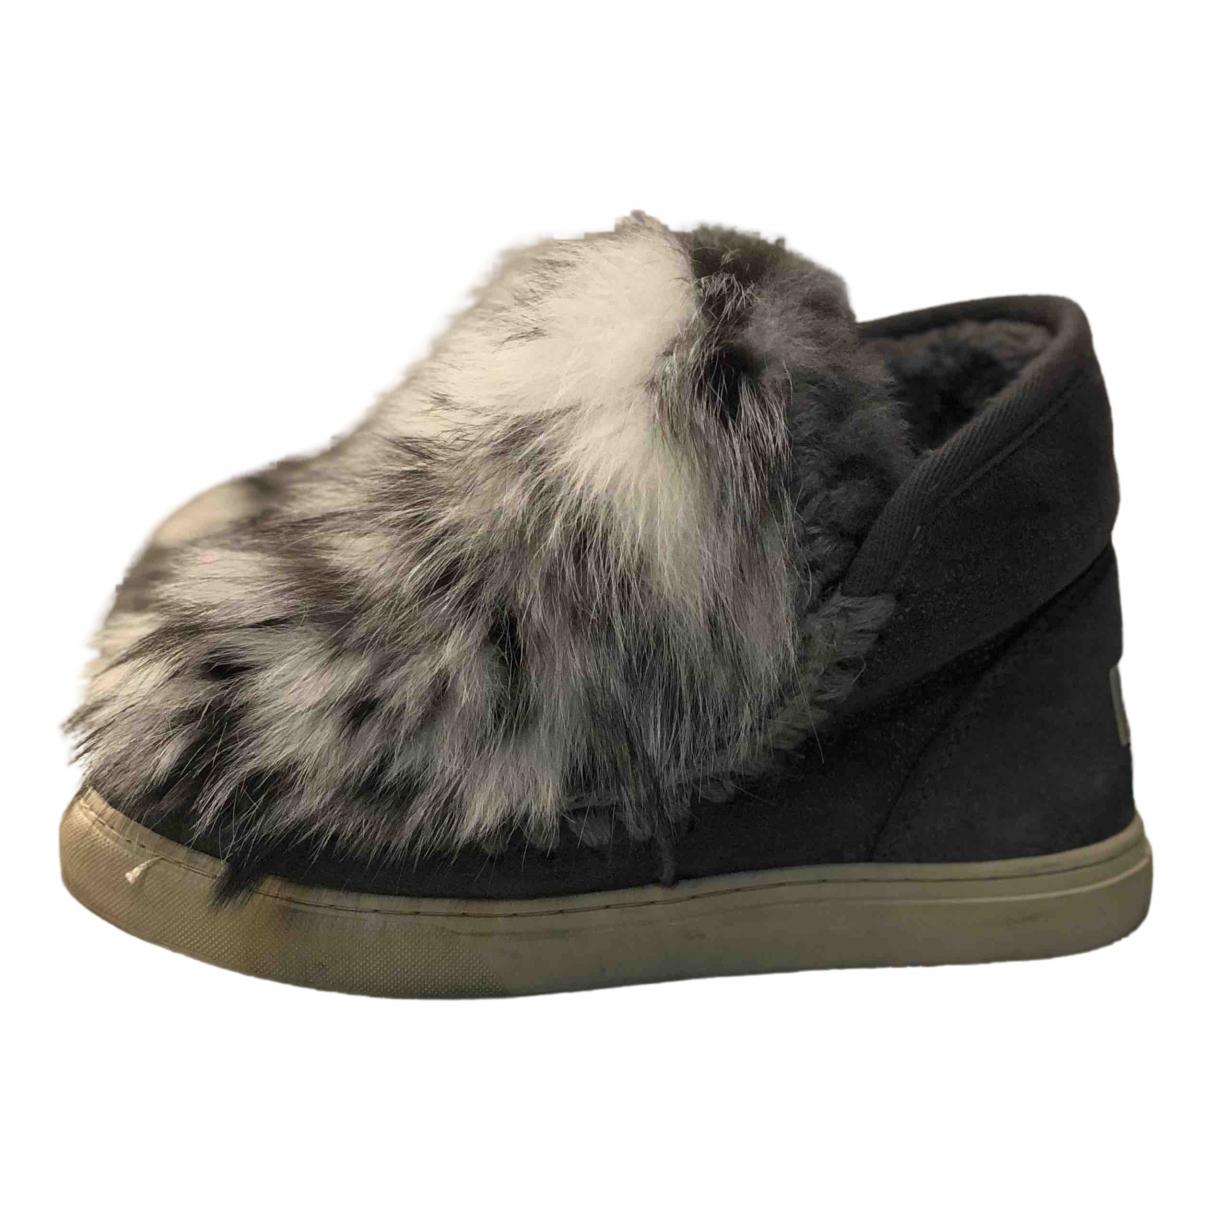 Mou N Grey Fur Trainers for Women 37 IT